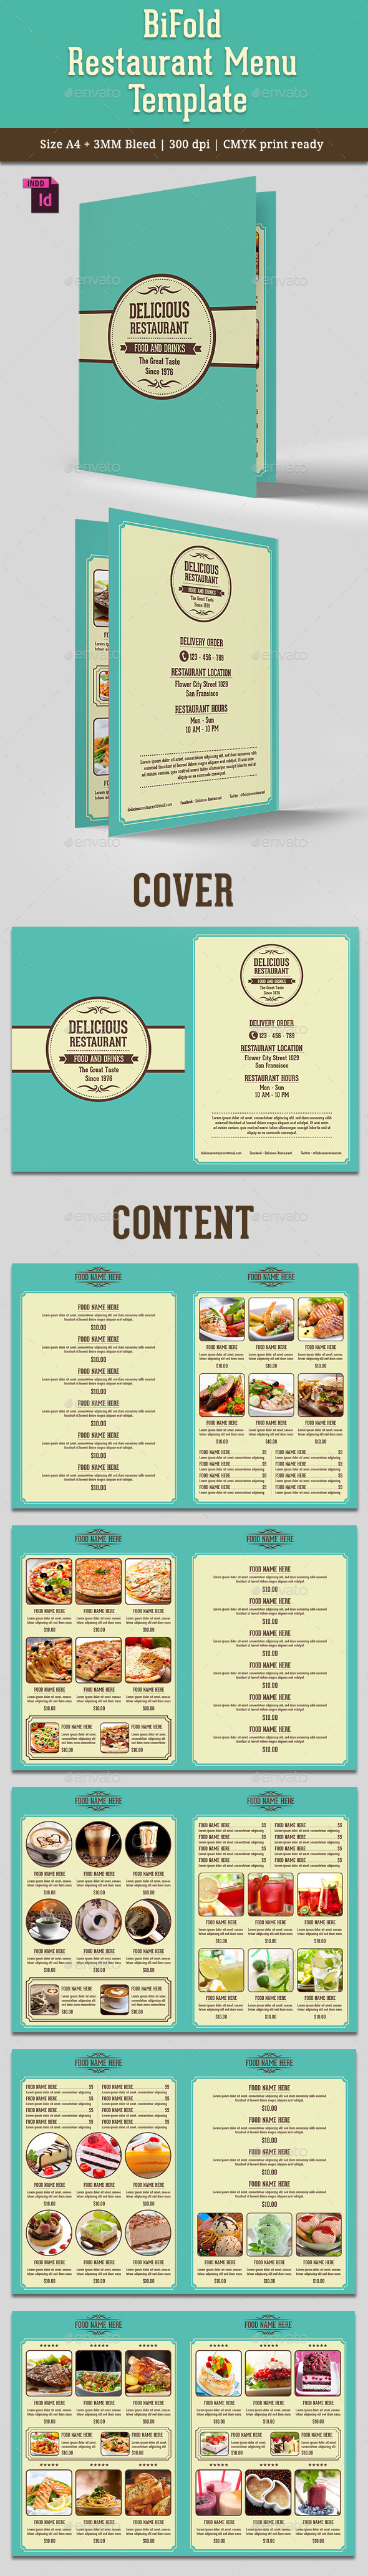 BiFold Restaurant Menu Vol. 6 - Food Menus Print Templates